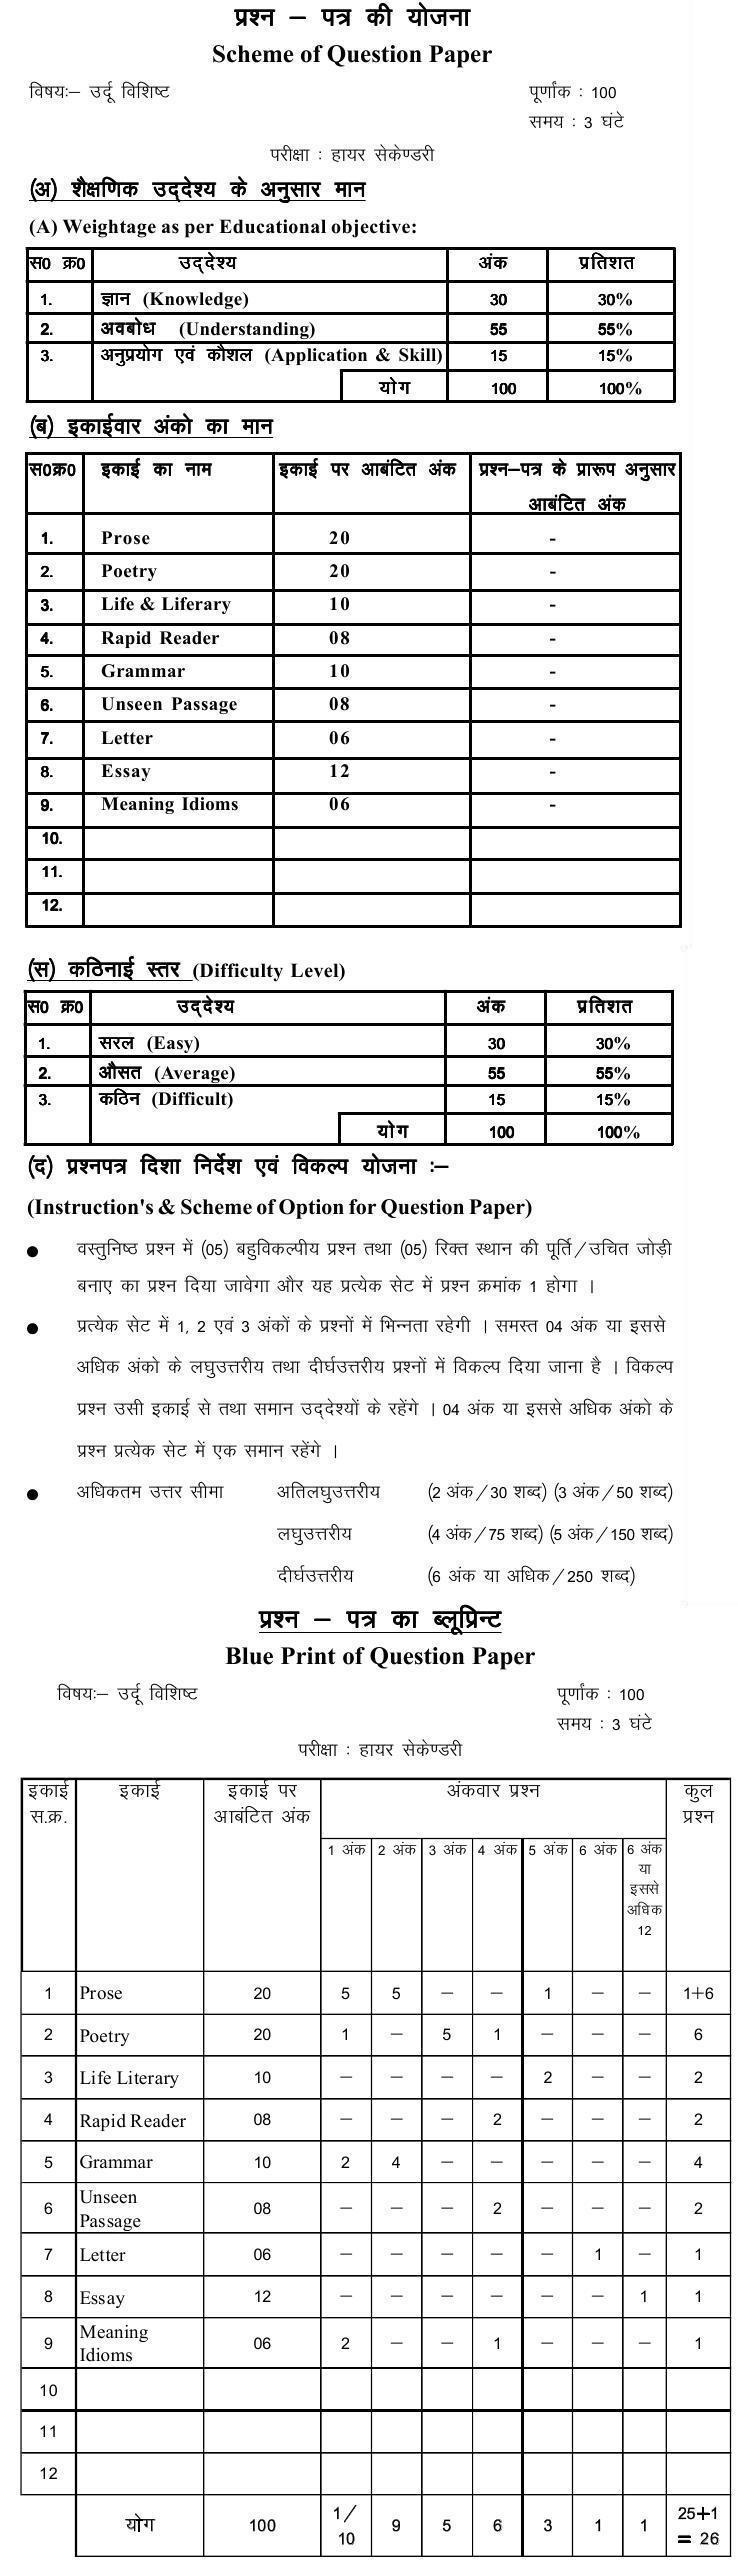 Chattisgarh Board Class 12 Scheme and Blue Print of Urdu Special